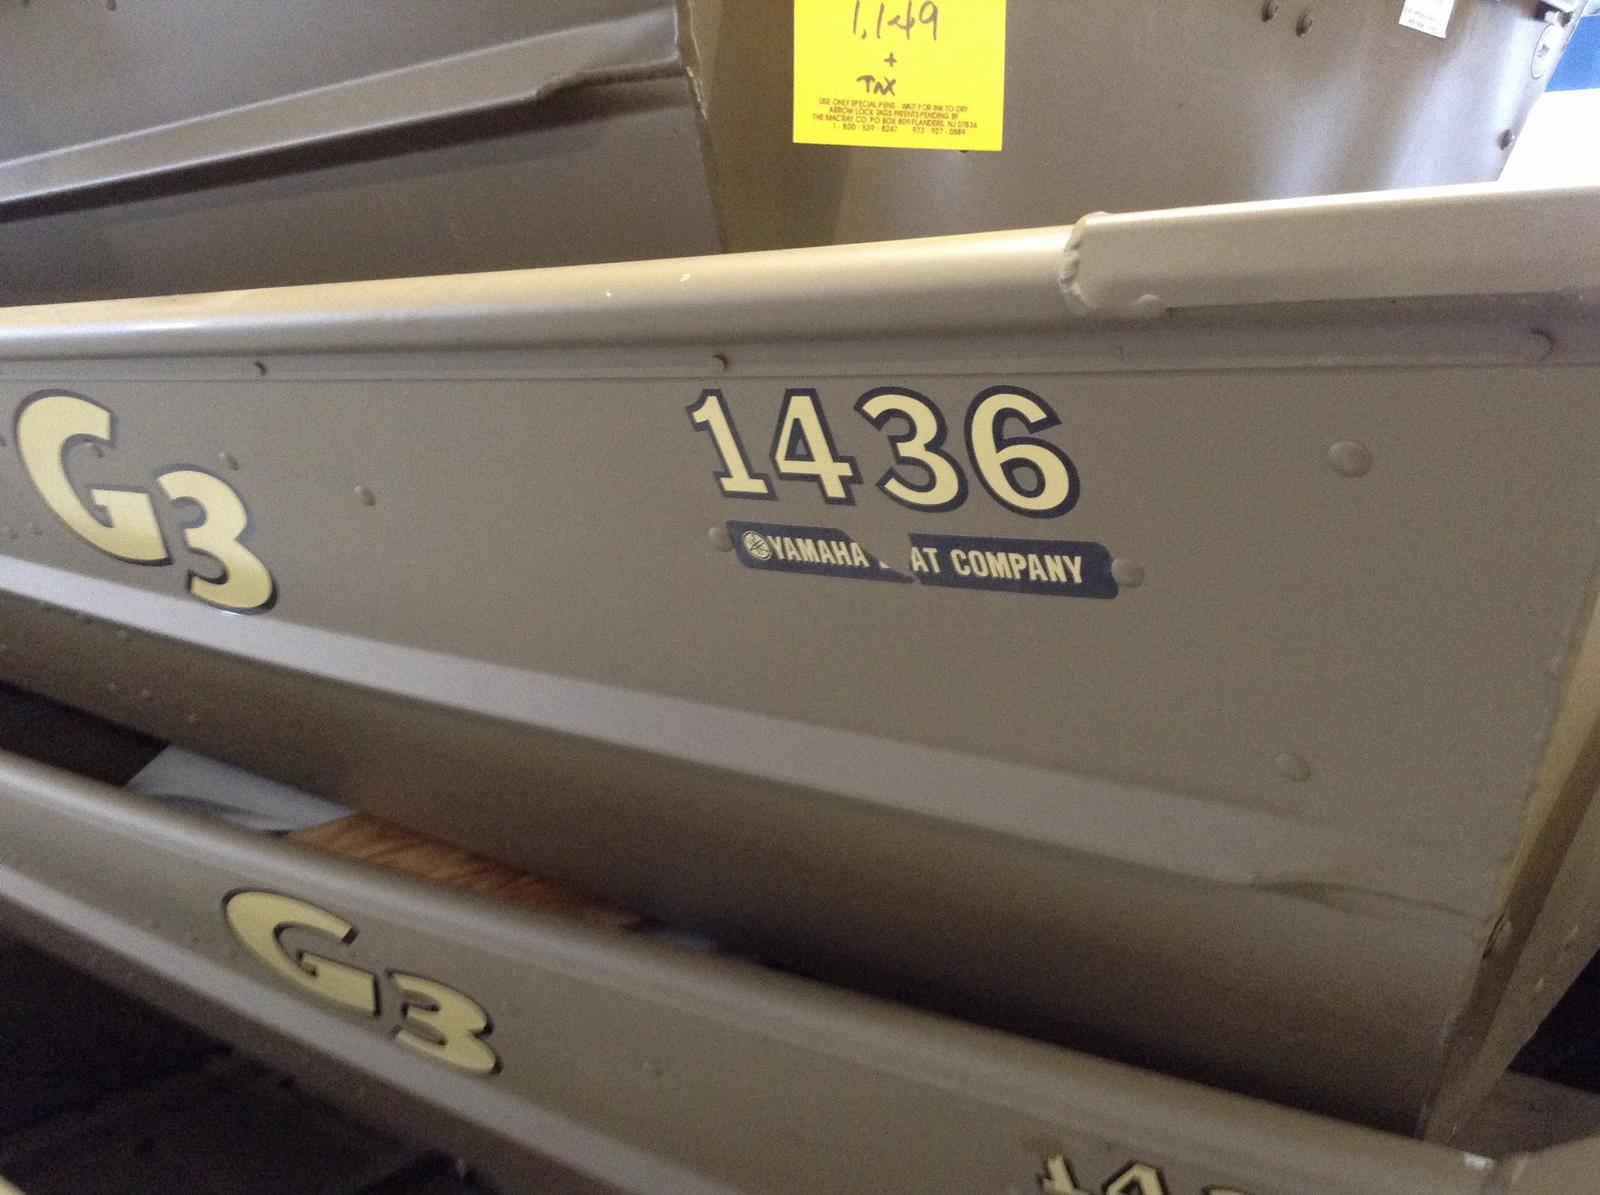 G3 1436